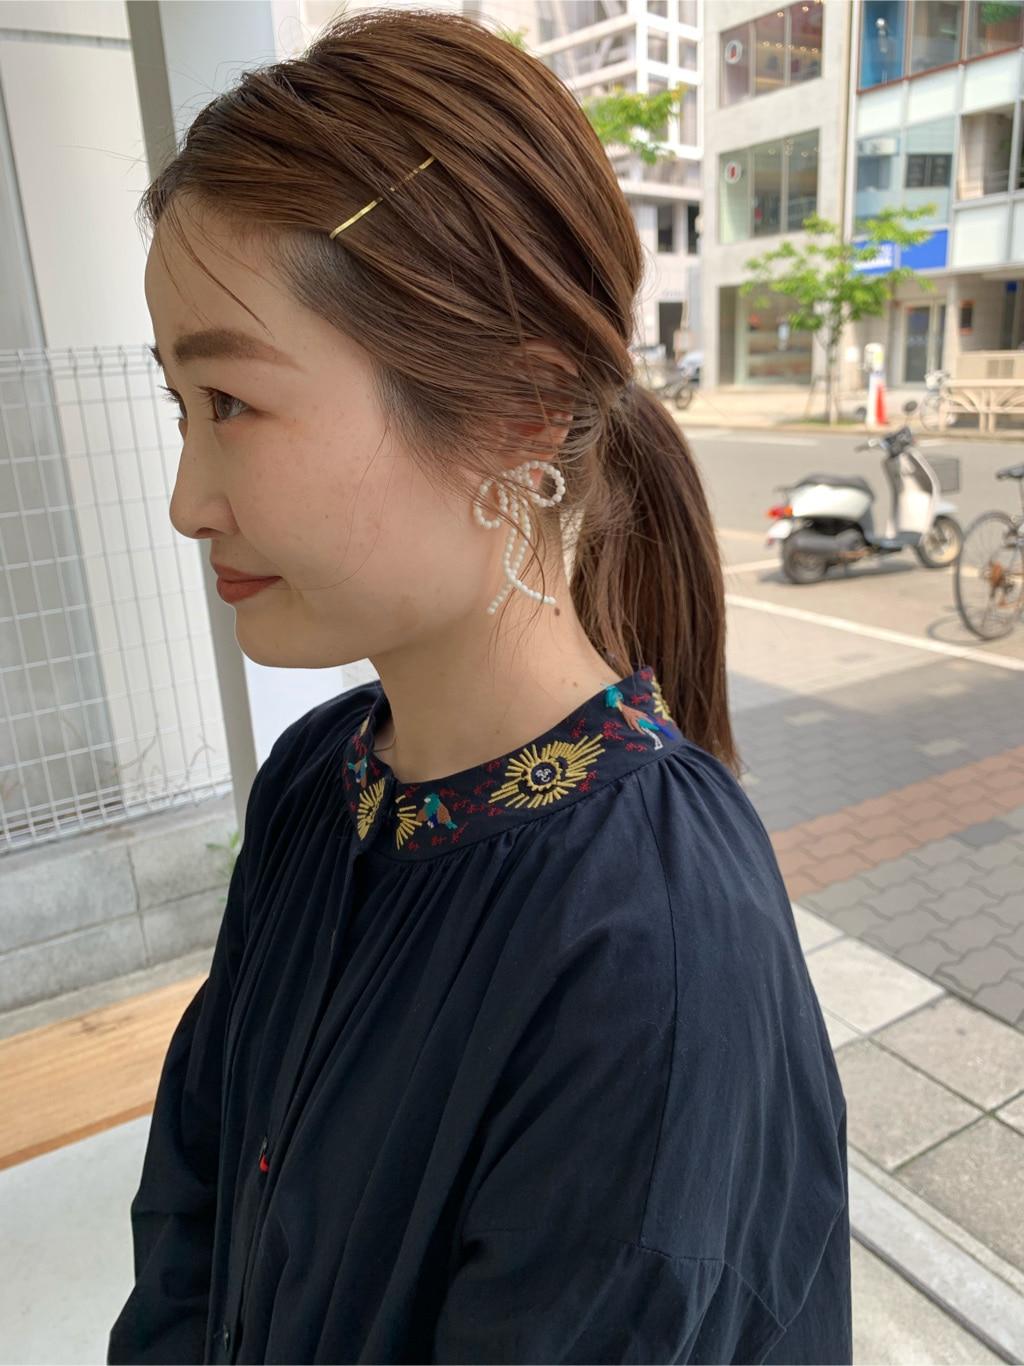 l'atelier du savon 名古屋栄路面 身長:159cm 2020.05.06